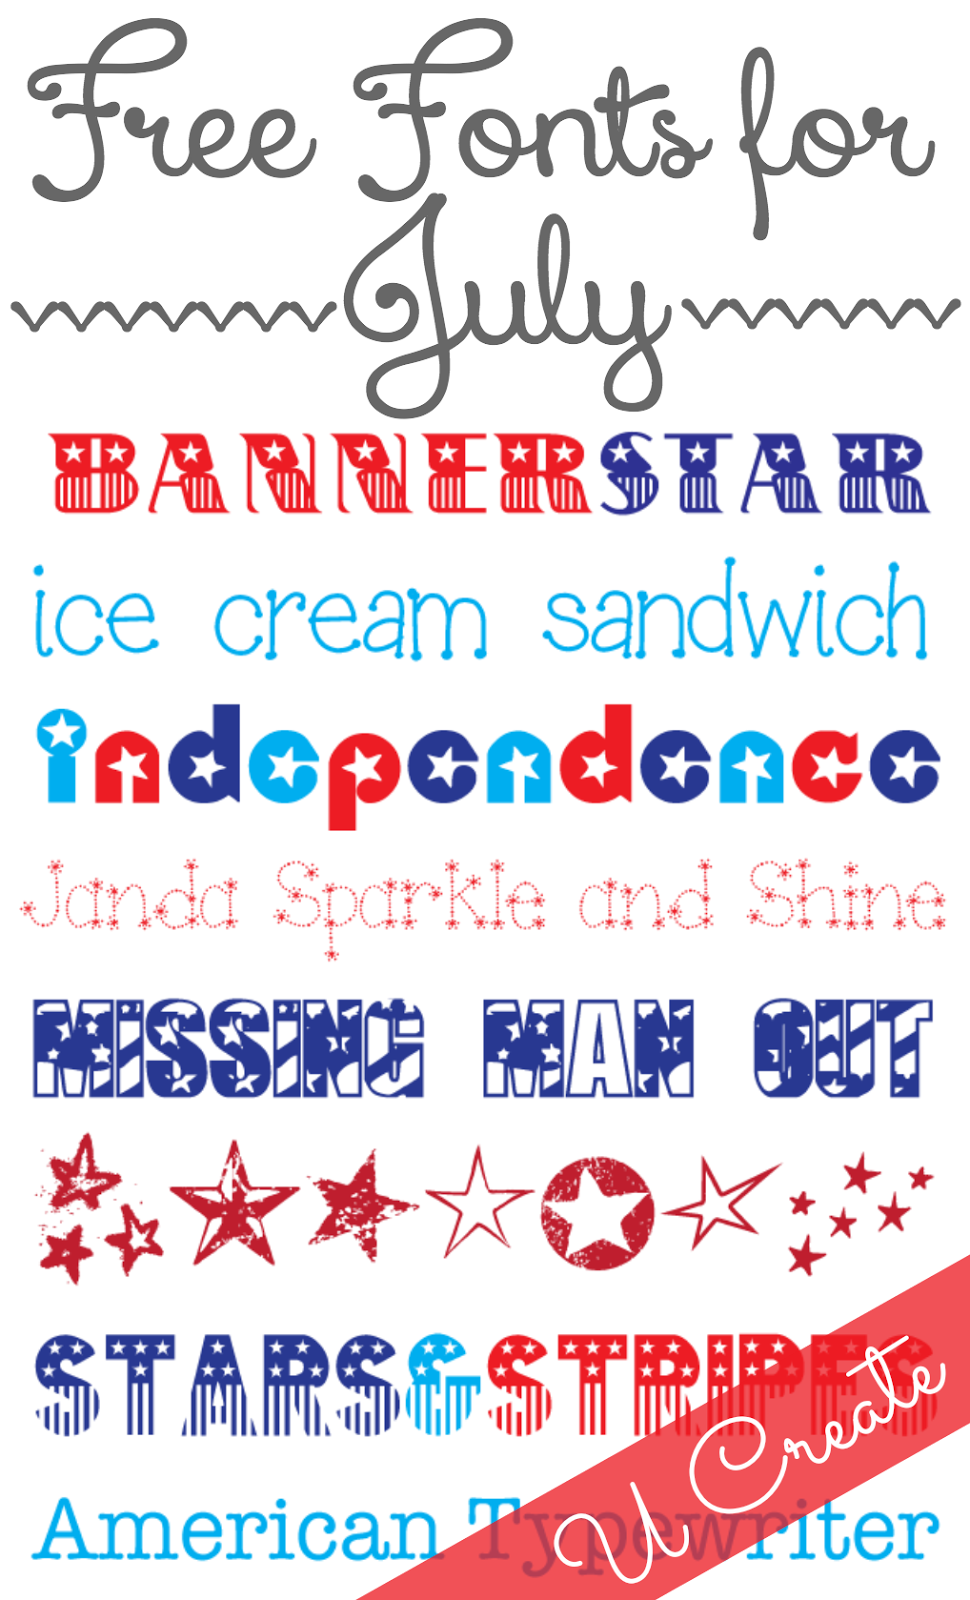 http://2.bp.blogspot.com/-VV1BwZQ2NvA/U6CprtGHg1I/AAAAAAAAUBY/ixxKXlWj0Tg/s1600/Favorite+Free+Fonts+for+July+at+U-createcrafts.com.png